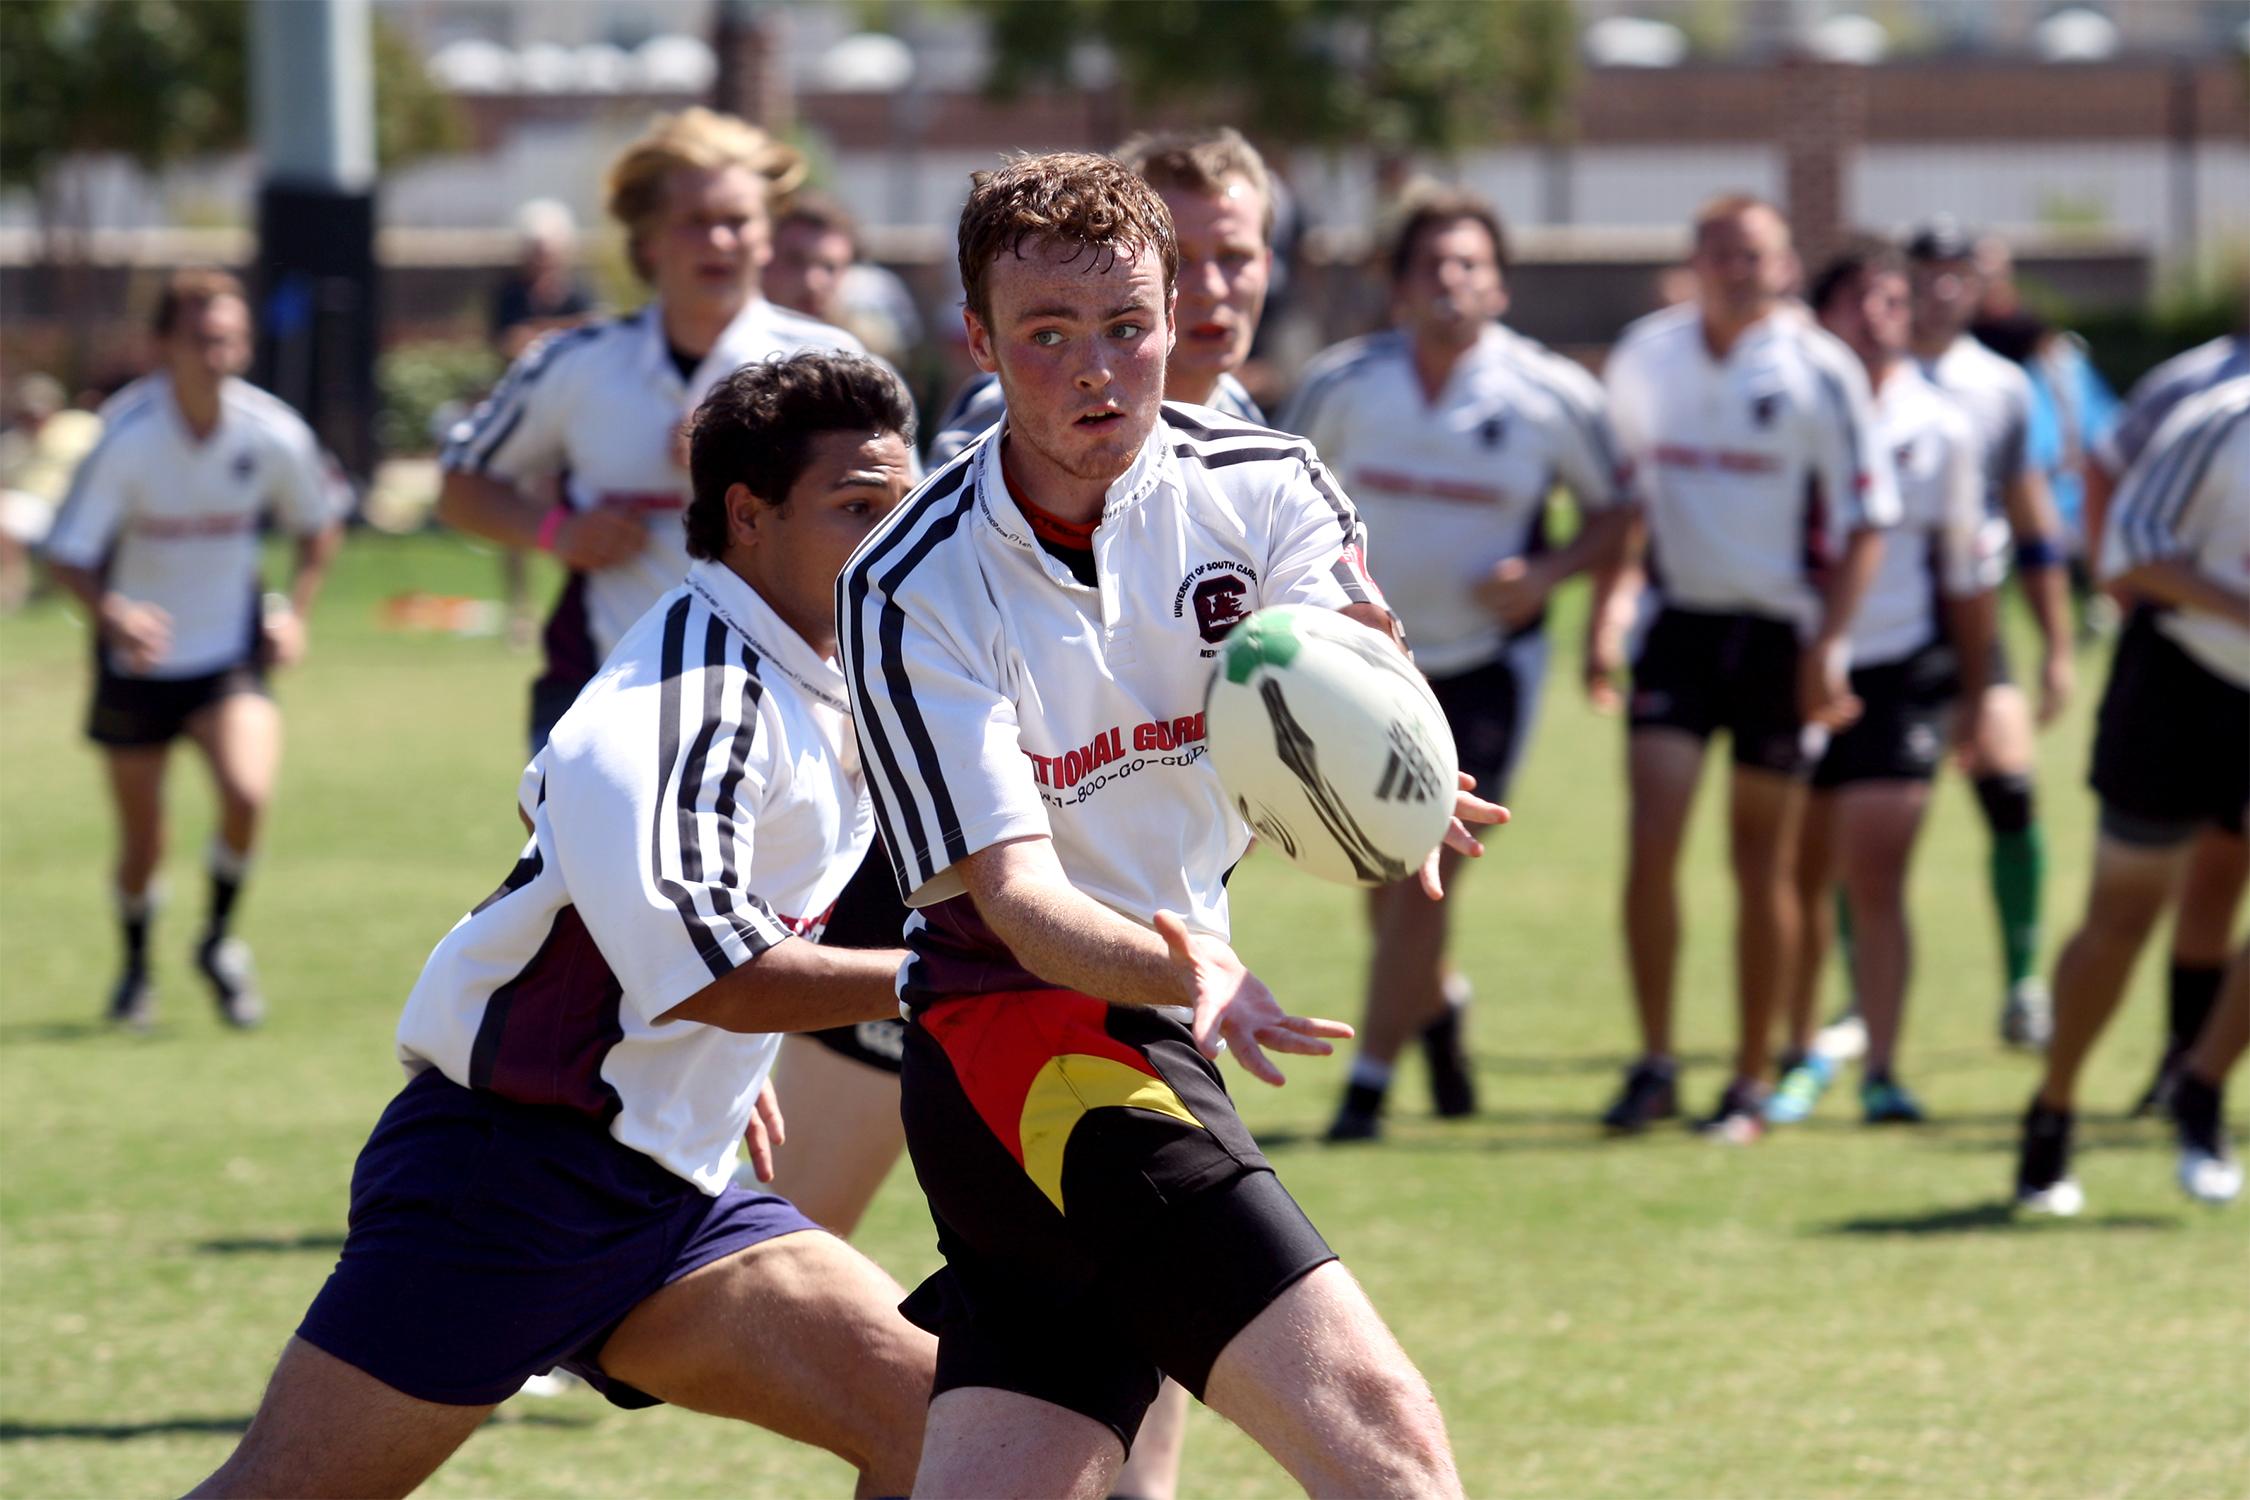 20110910_SC_Rugby_DHG_057 copy.jpg